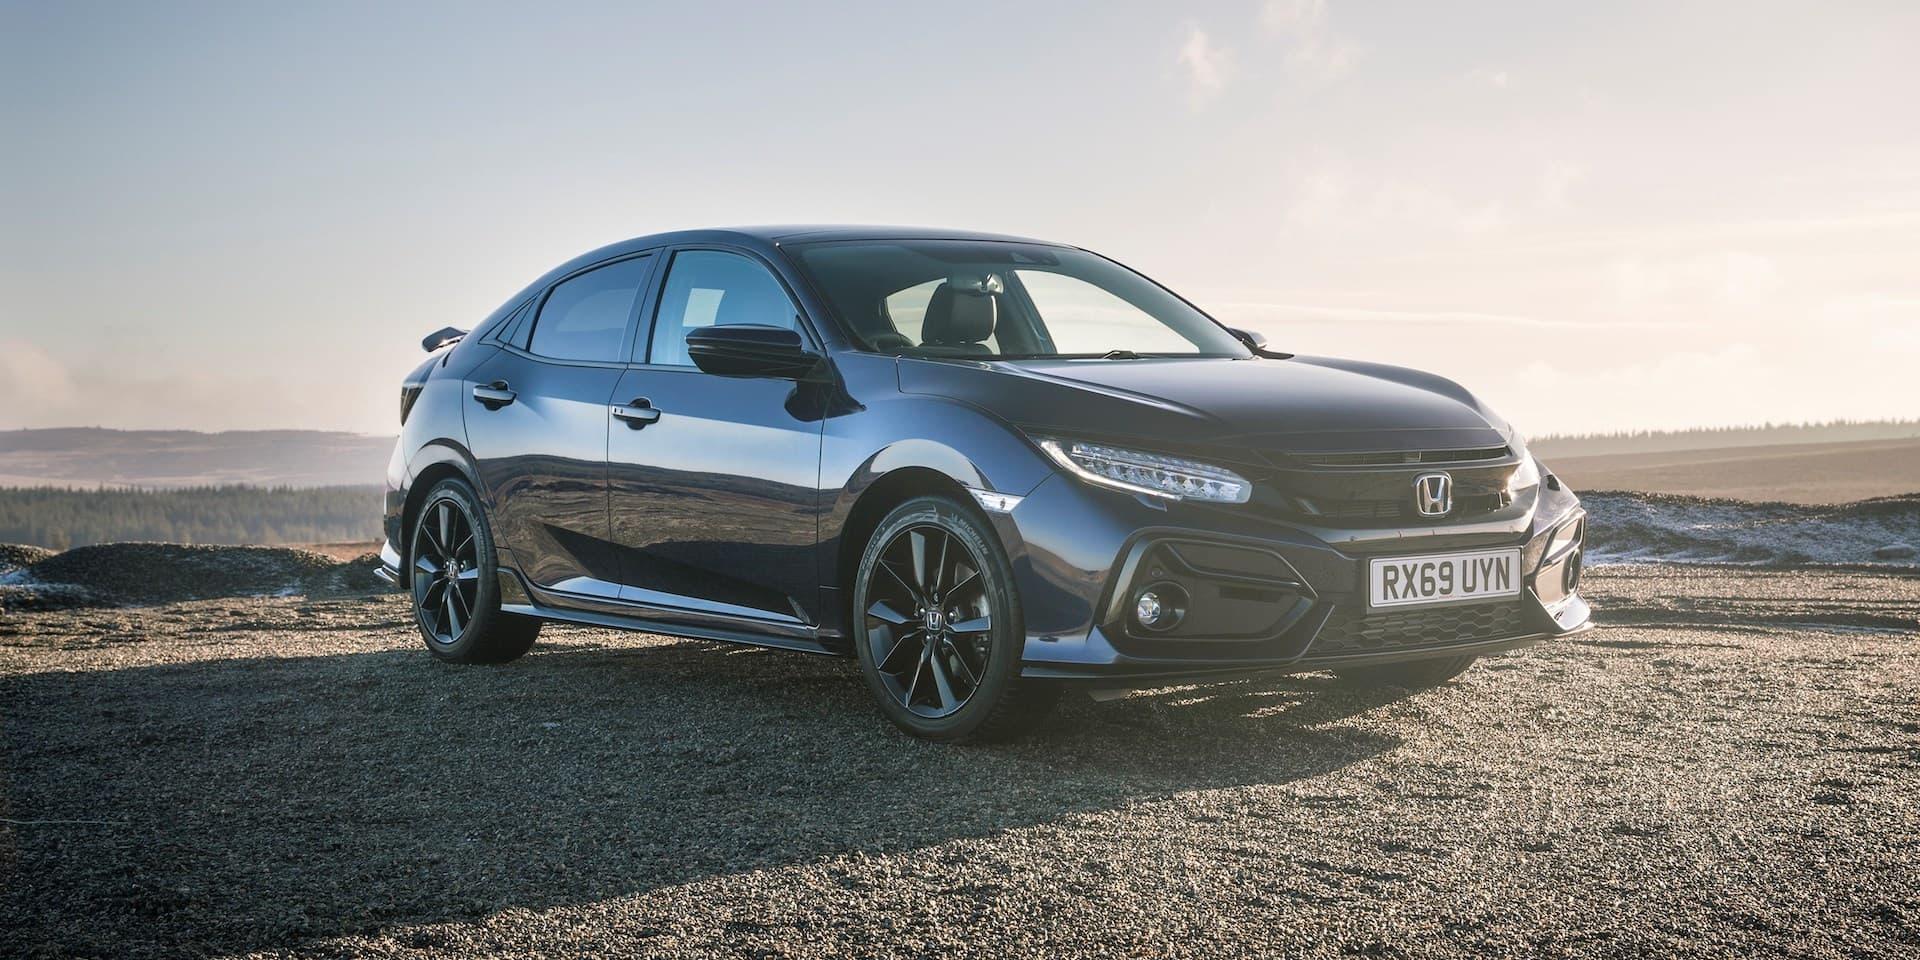 Honda Civic (2017 onwards) Expert Rating